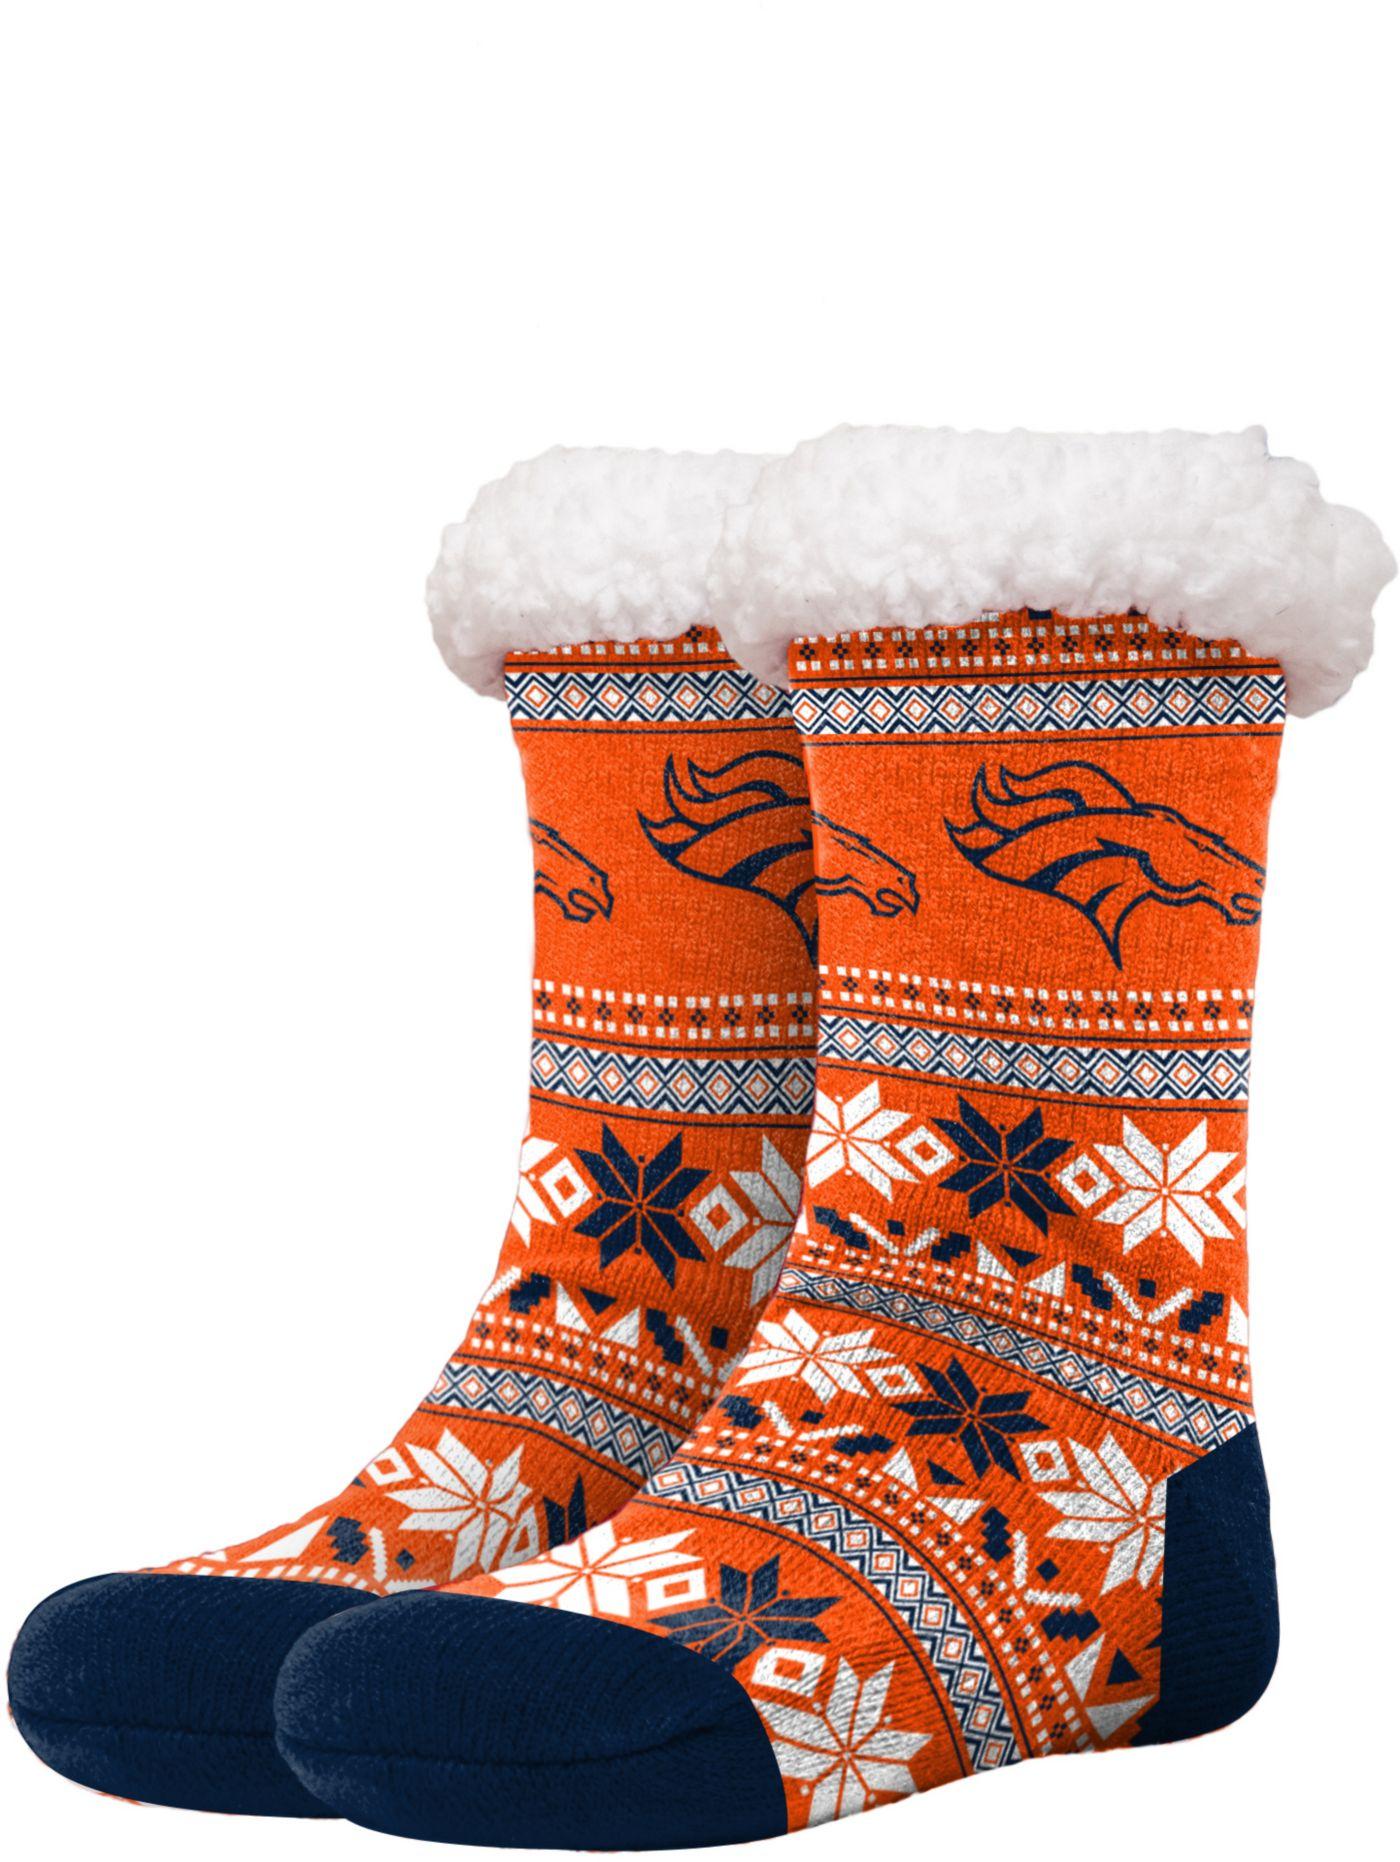 FOCO Denver Broncos Footy Slippers